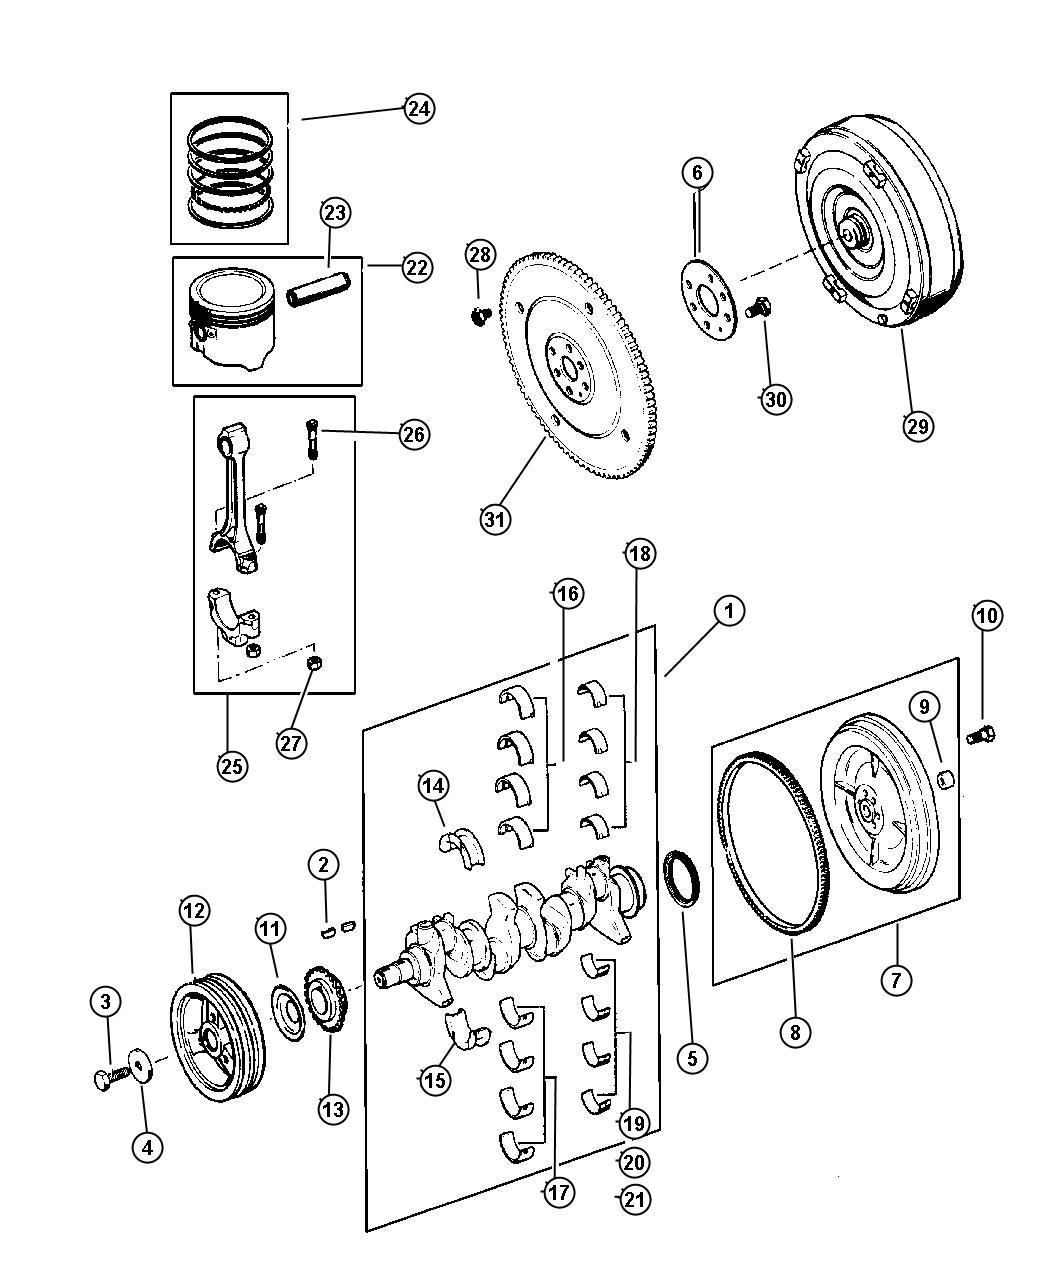 Jeep Wrangler Crankshaft Piston And Torque Converter 2 5